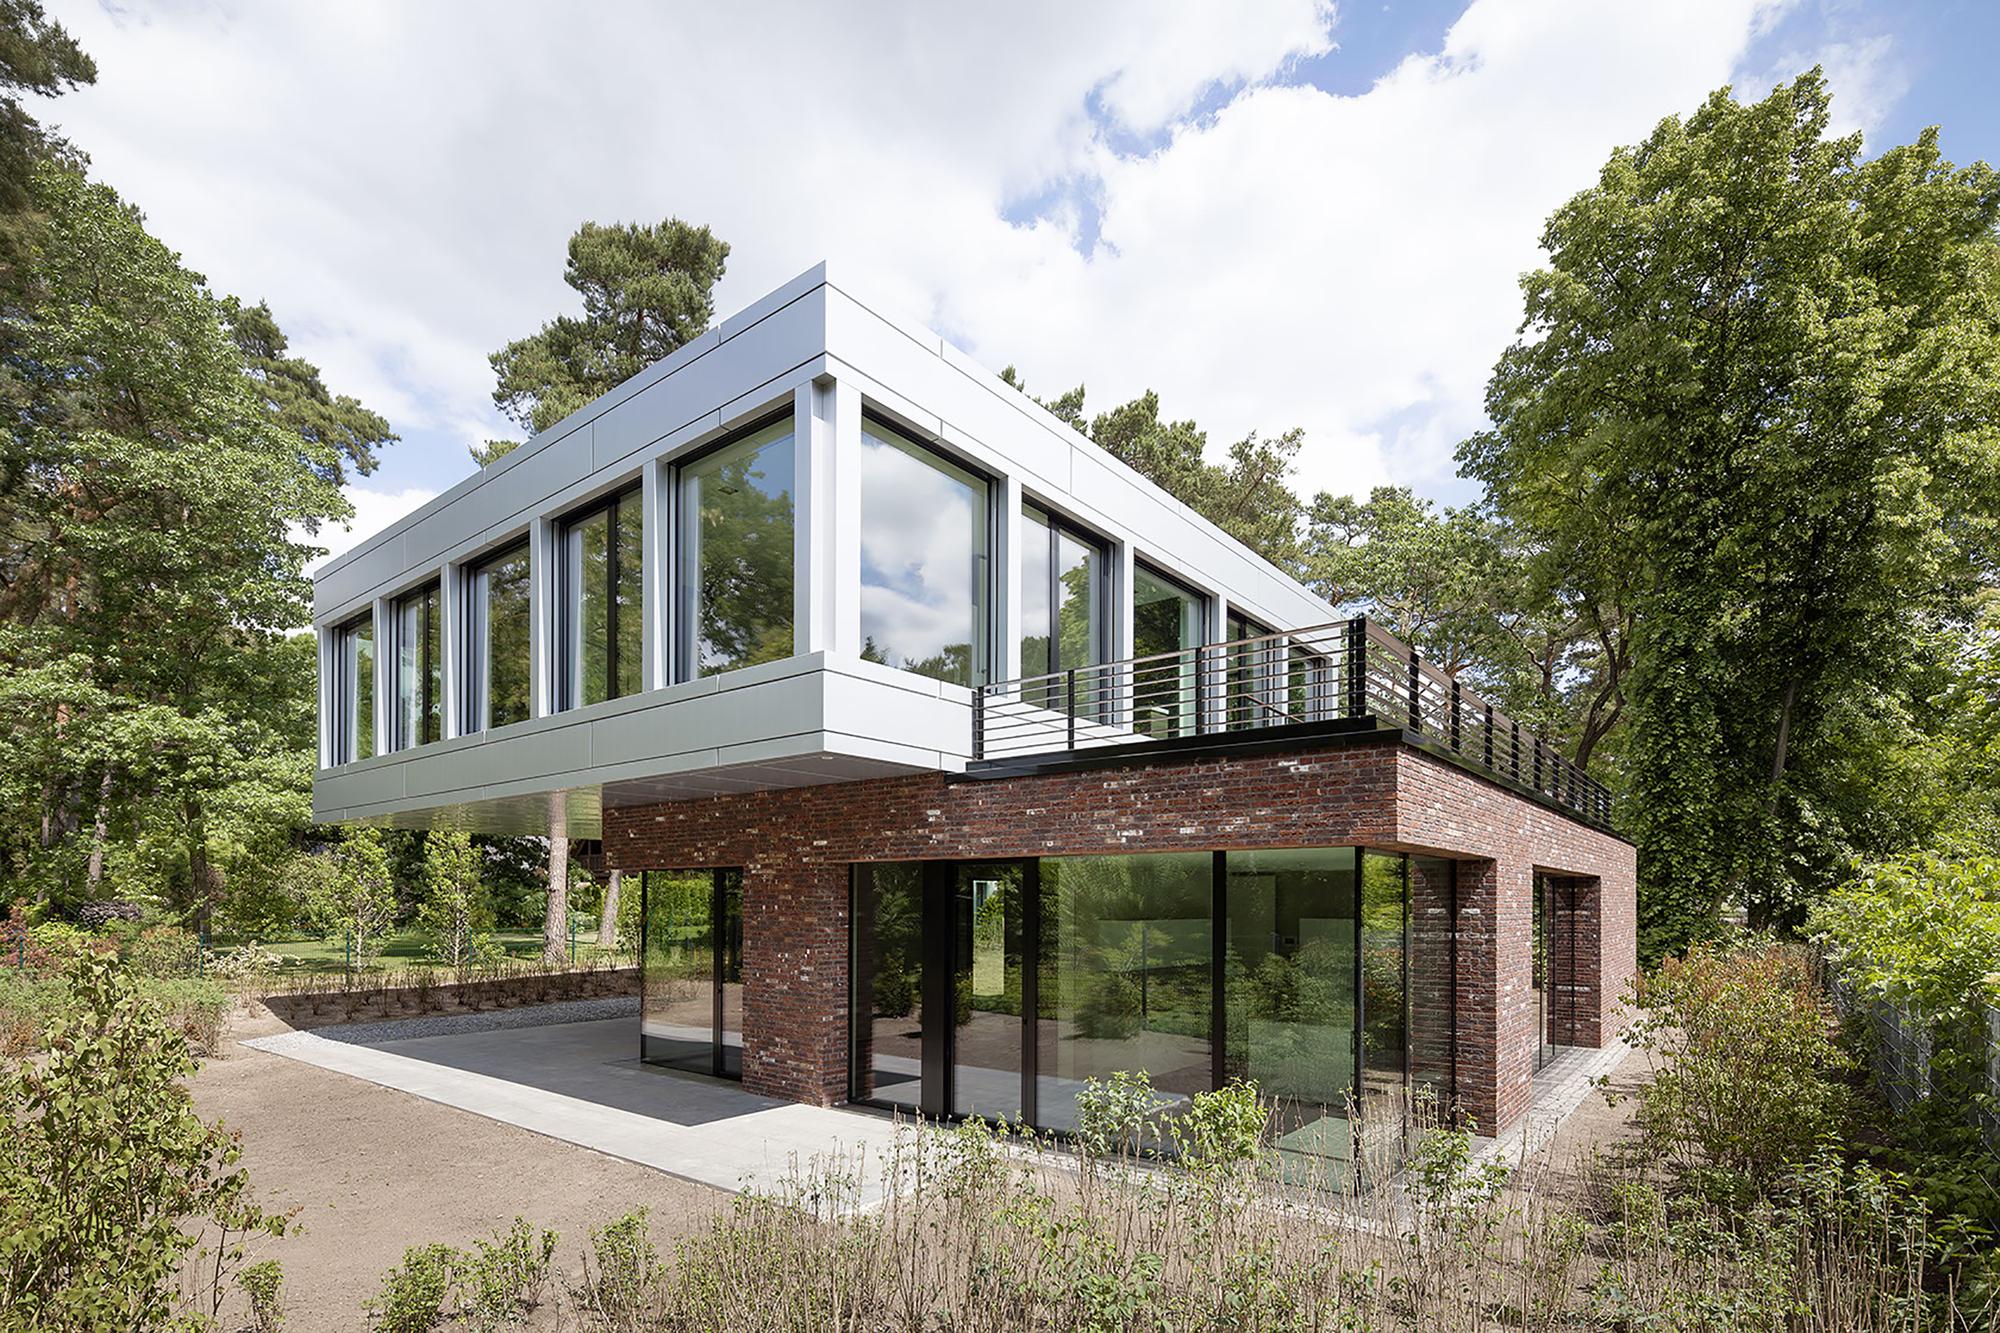 gallery of villa in potsdam tchoban voss architekten 9. Black Bedroom Furniture Sets. Home Design Ideas